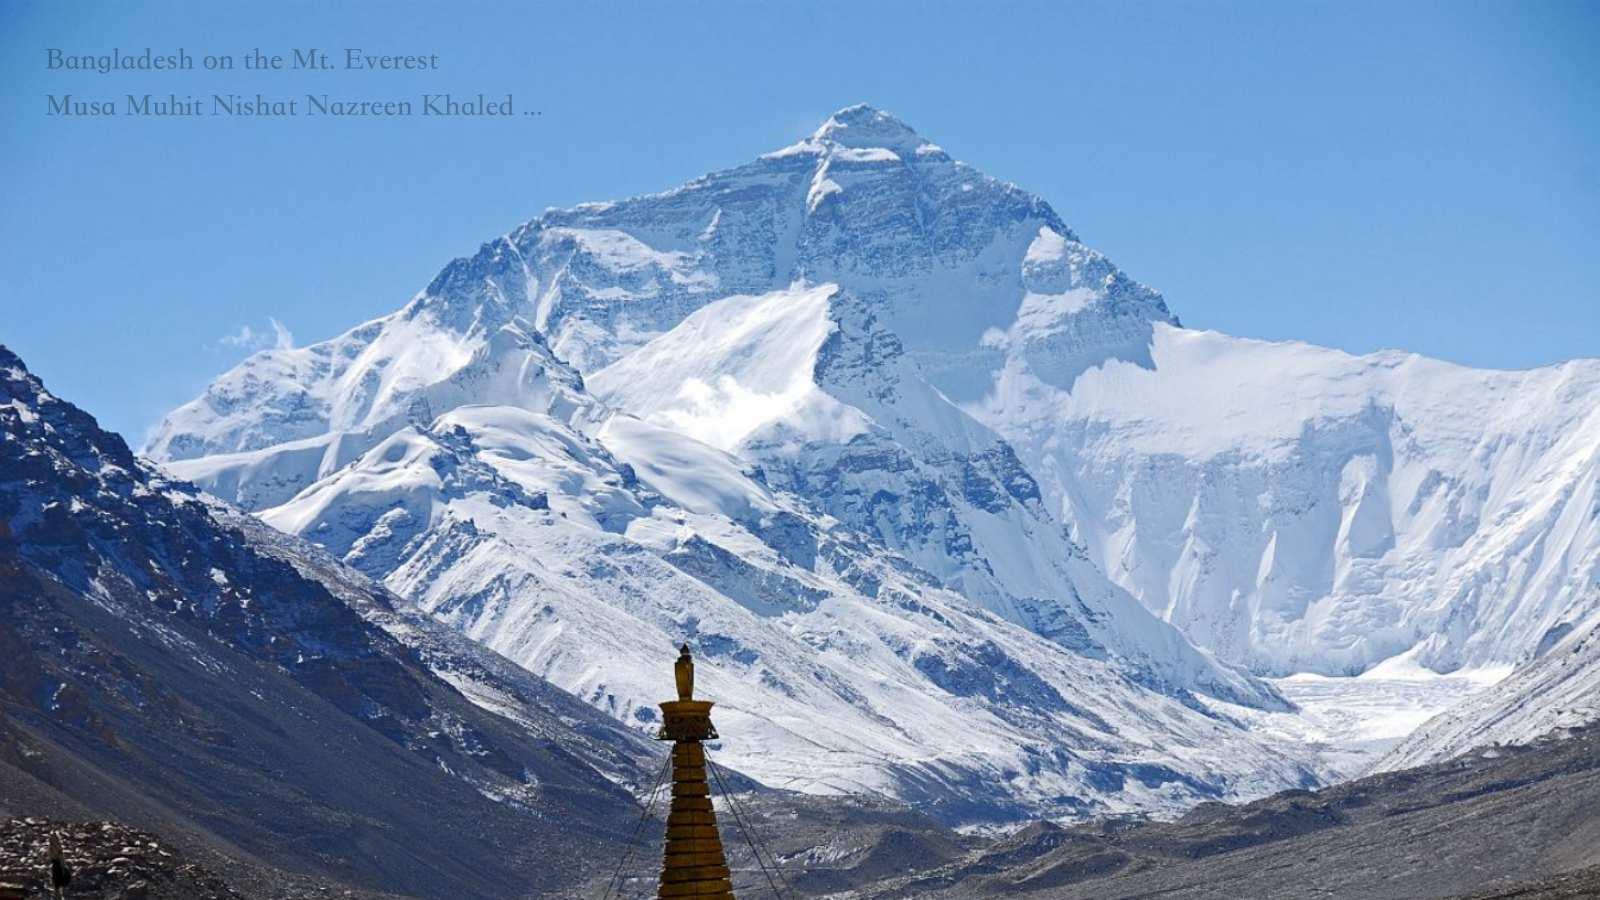 Bangladeshis on Mount Everest